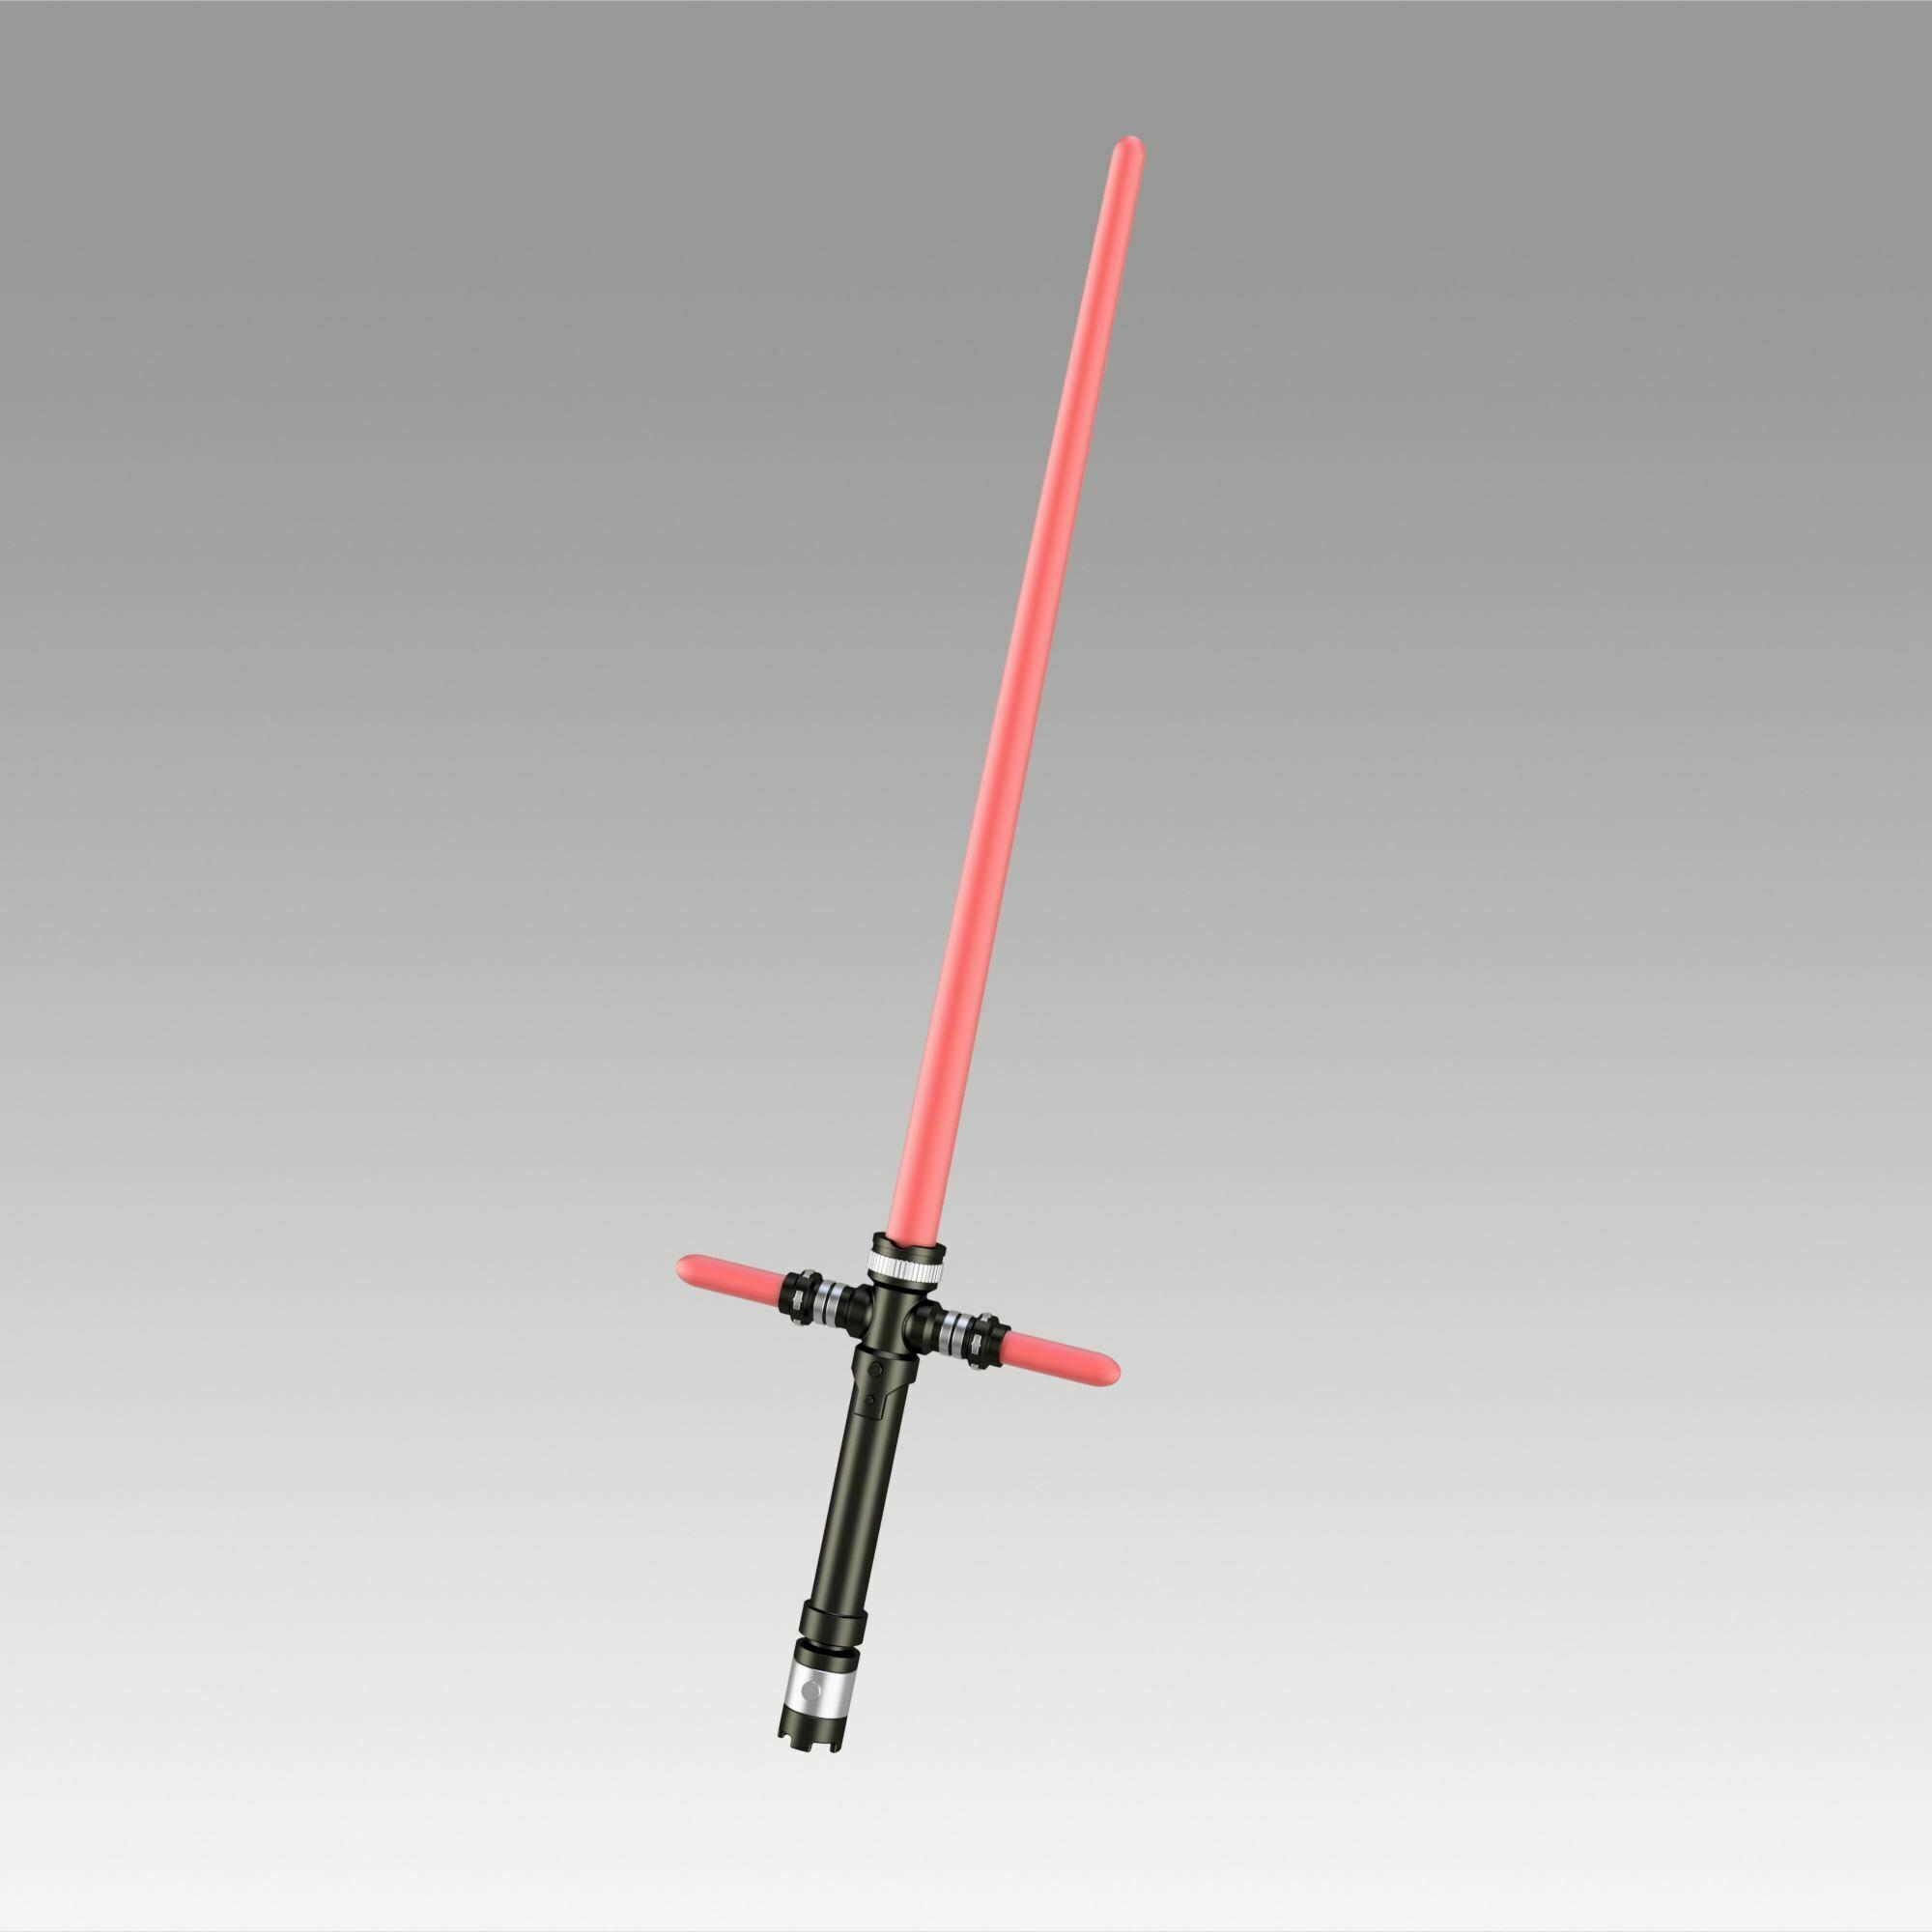 1.jpg Download OBJ file Star Wars VII The Force Awakens Kylo Ren Sword Cosplay Prop • 3D printer object, Blackeveryday